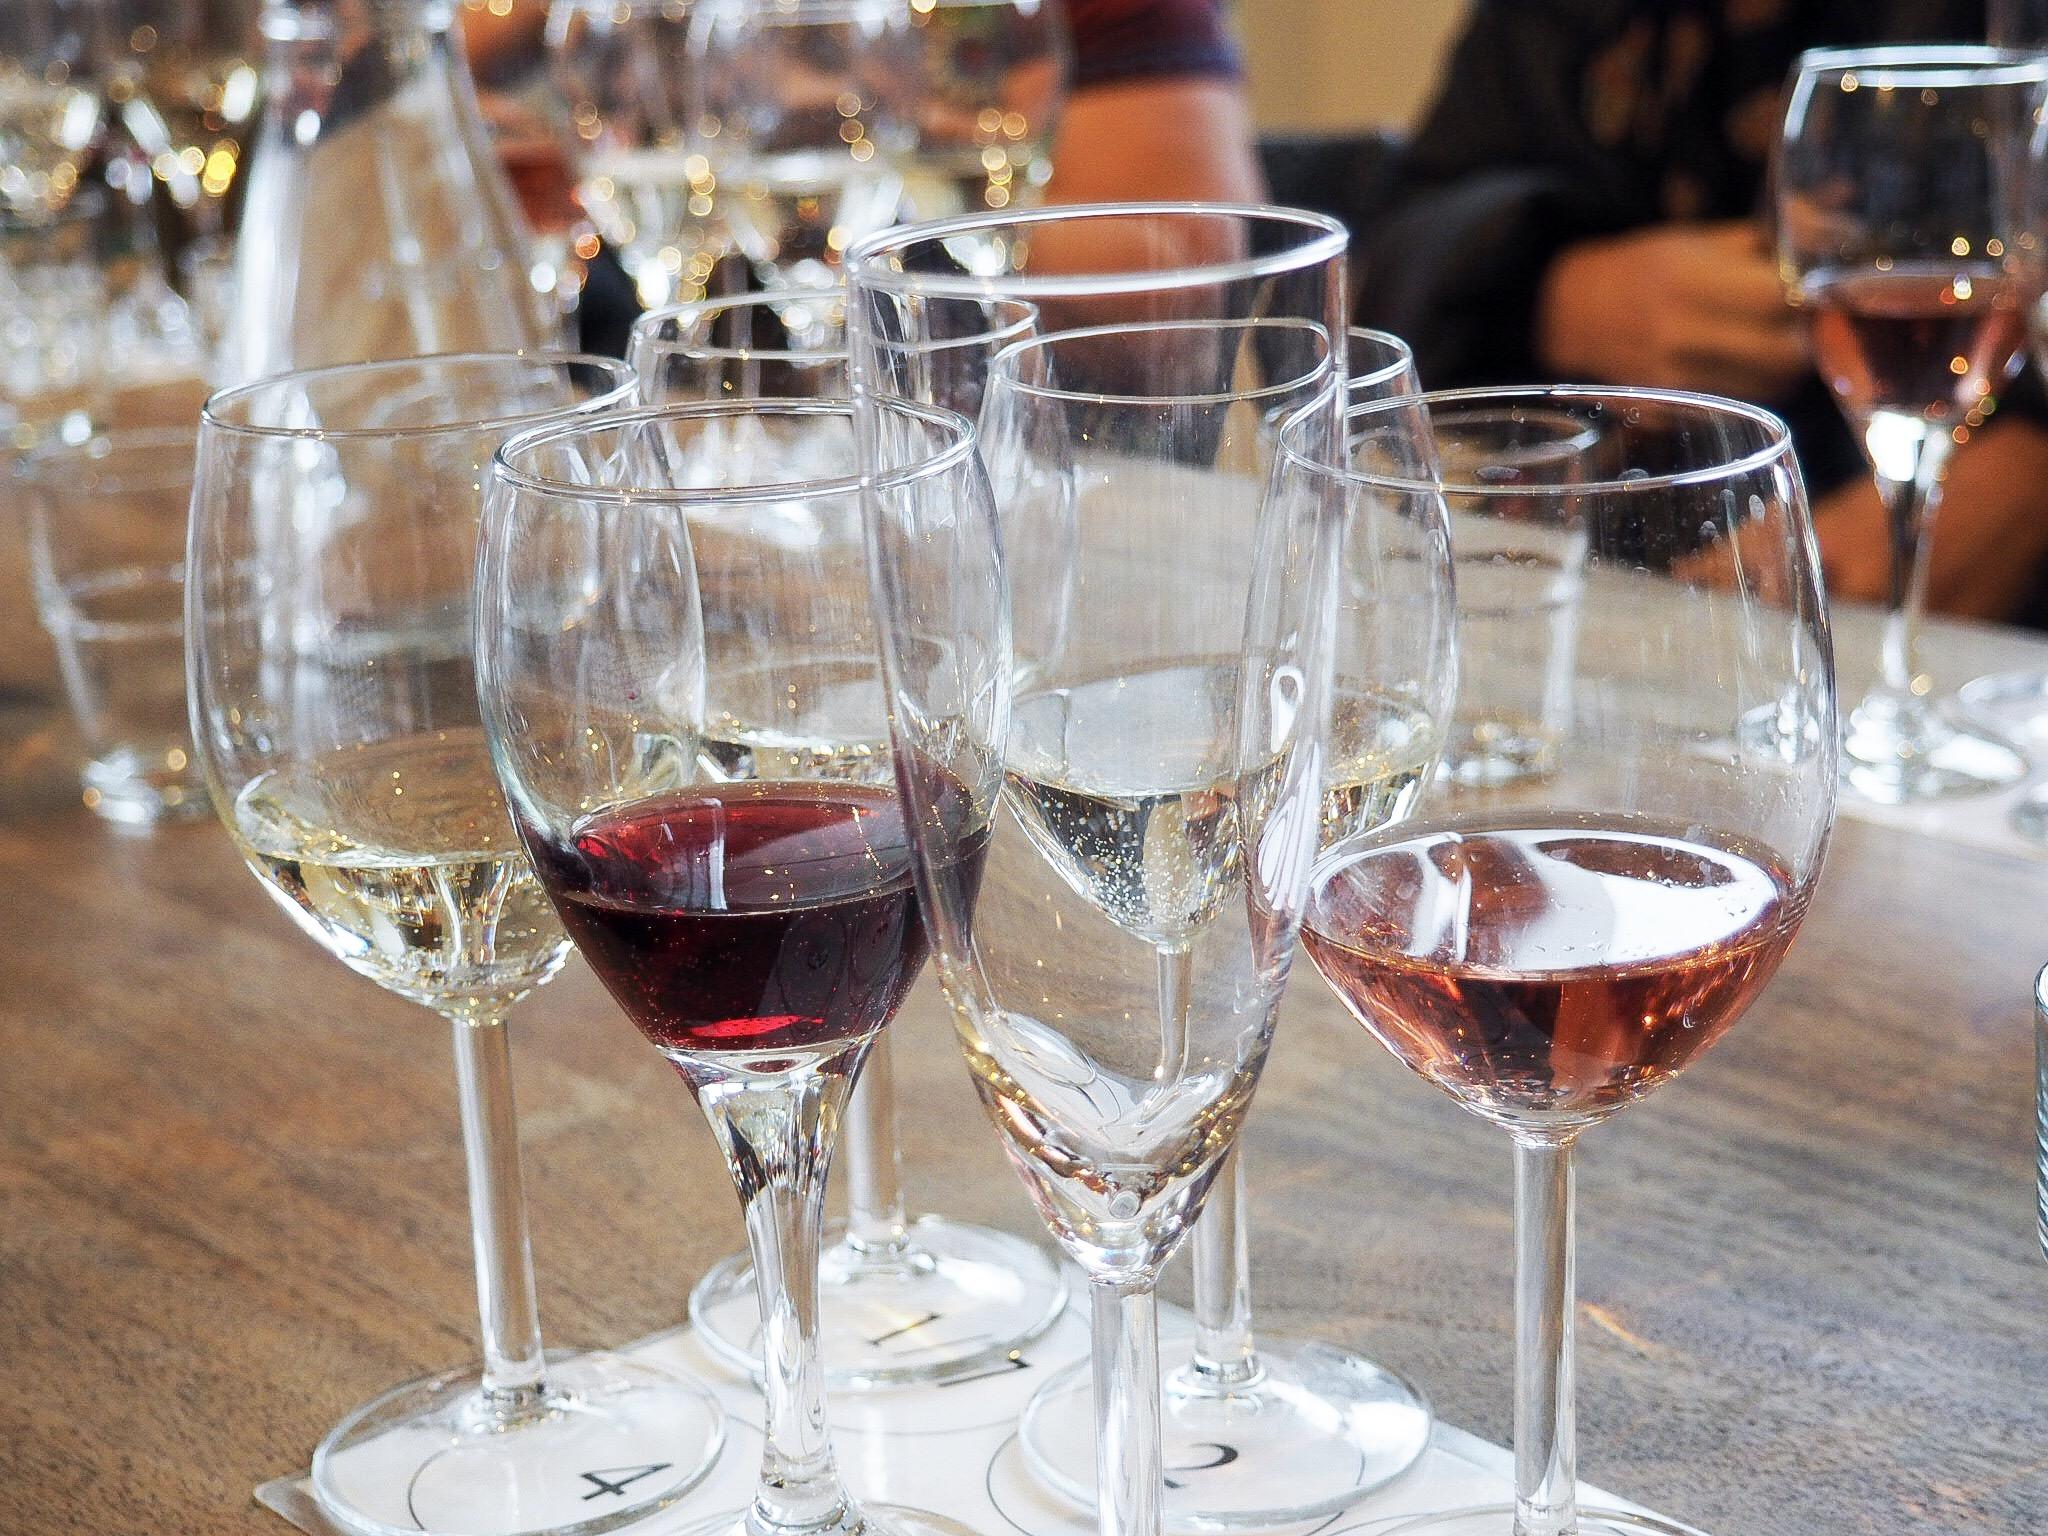 West Street Vineyard wine